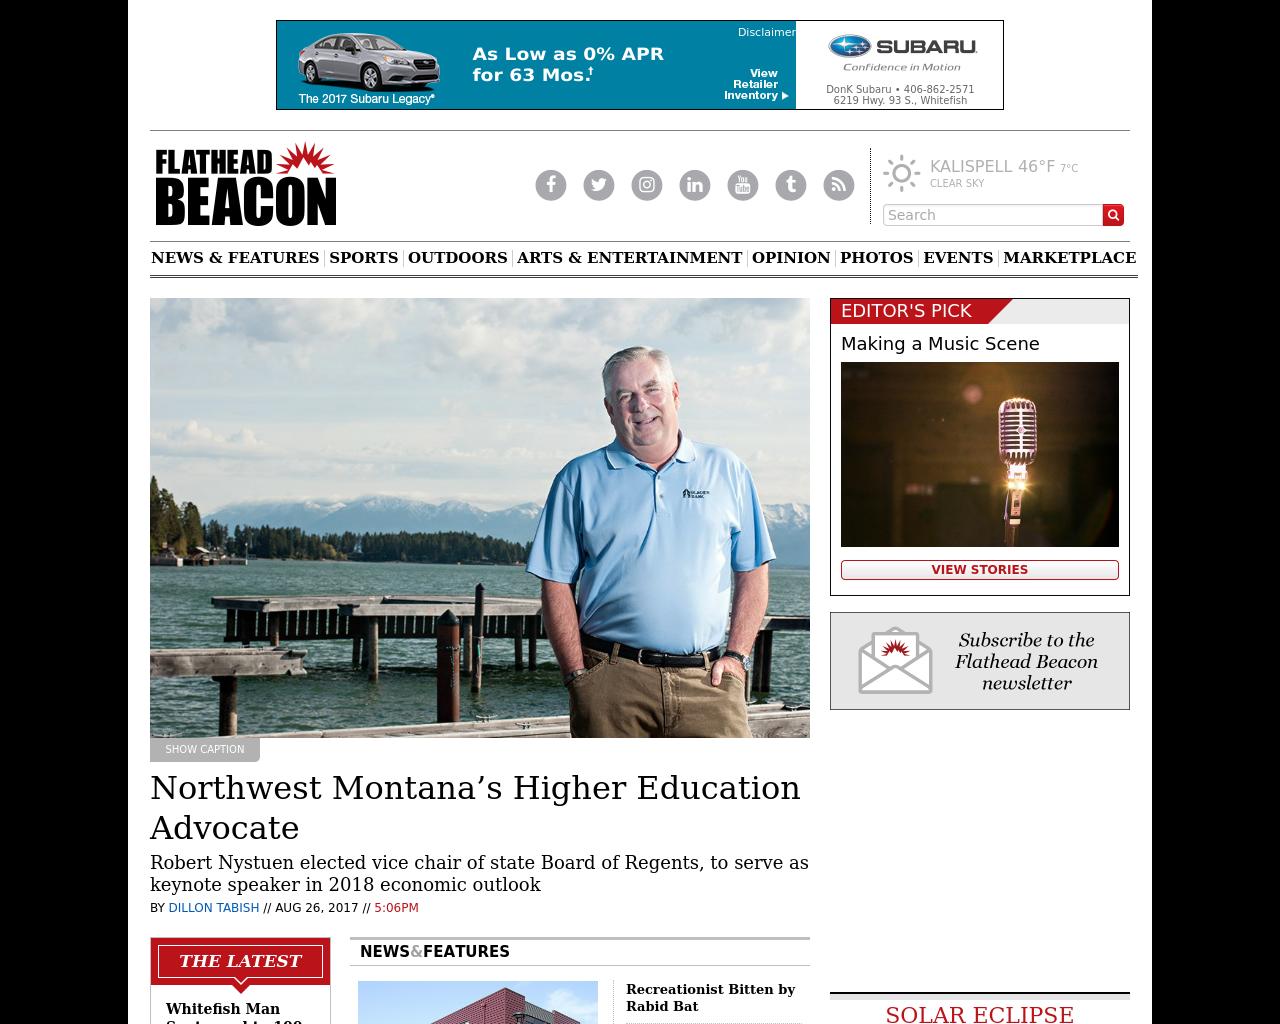 Flathead-Beacon-Advertising-Reviews-Pricing